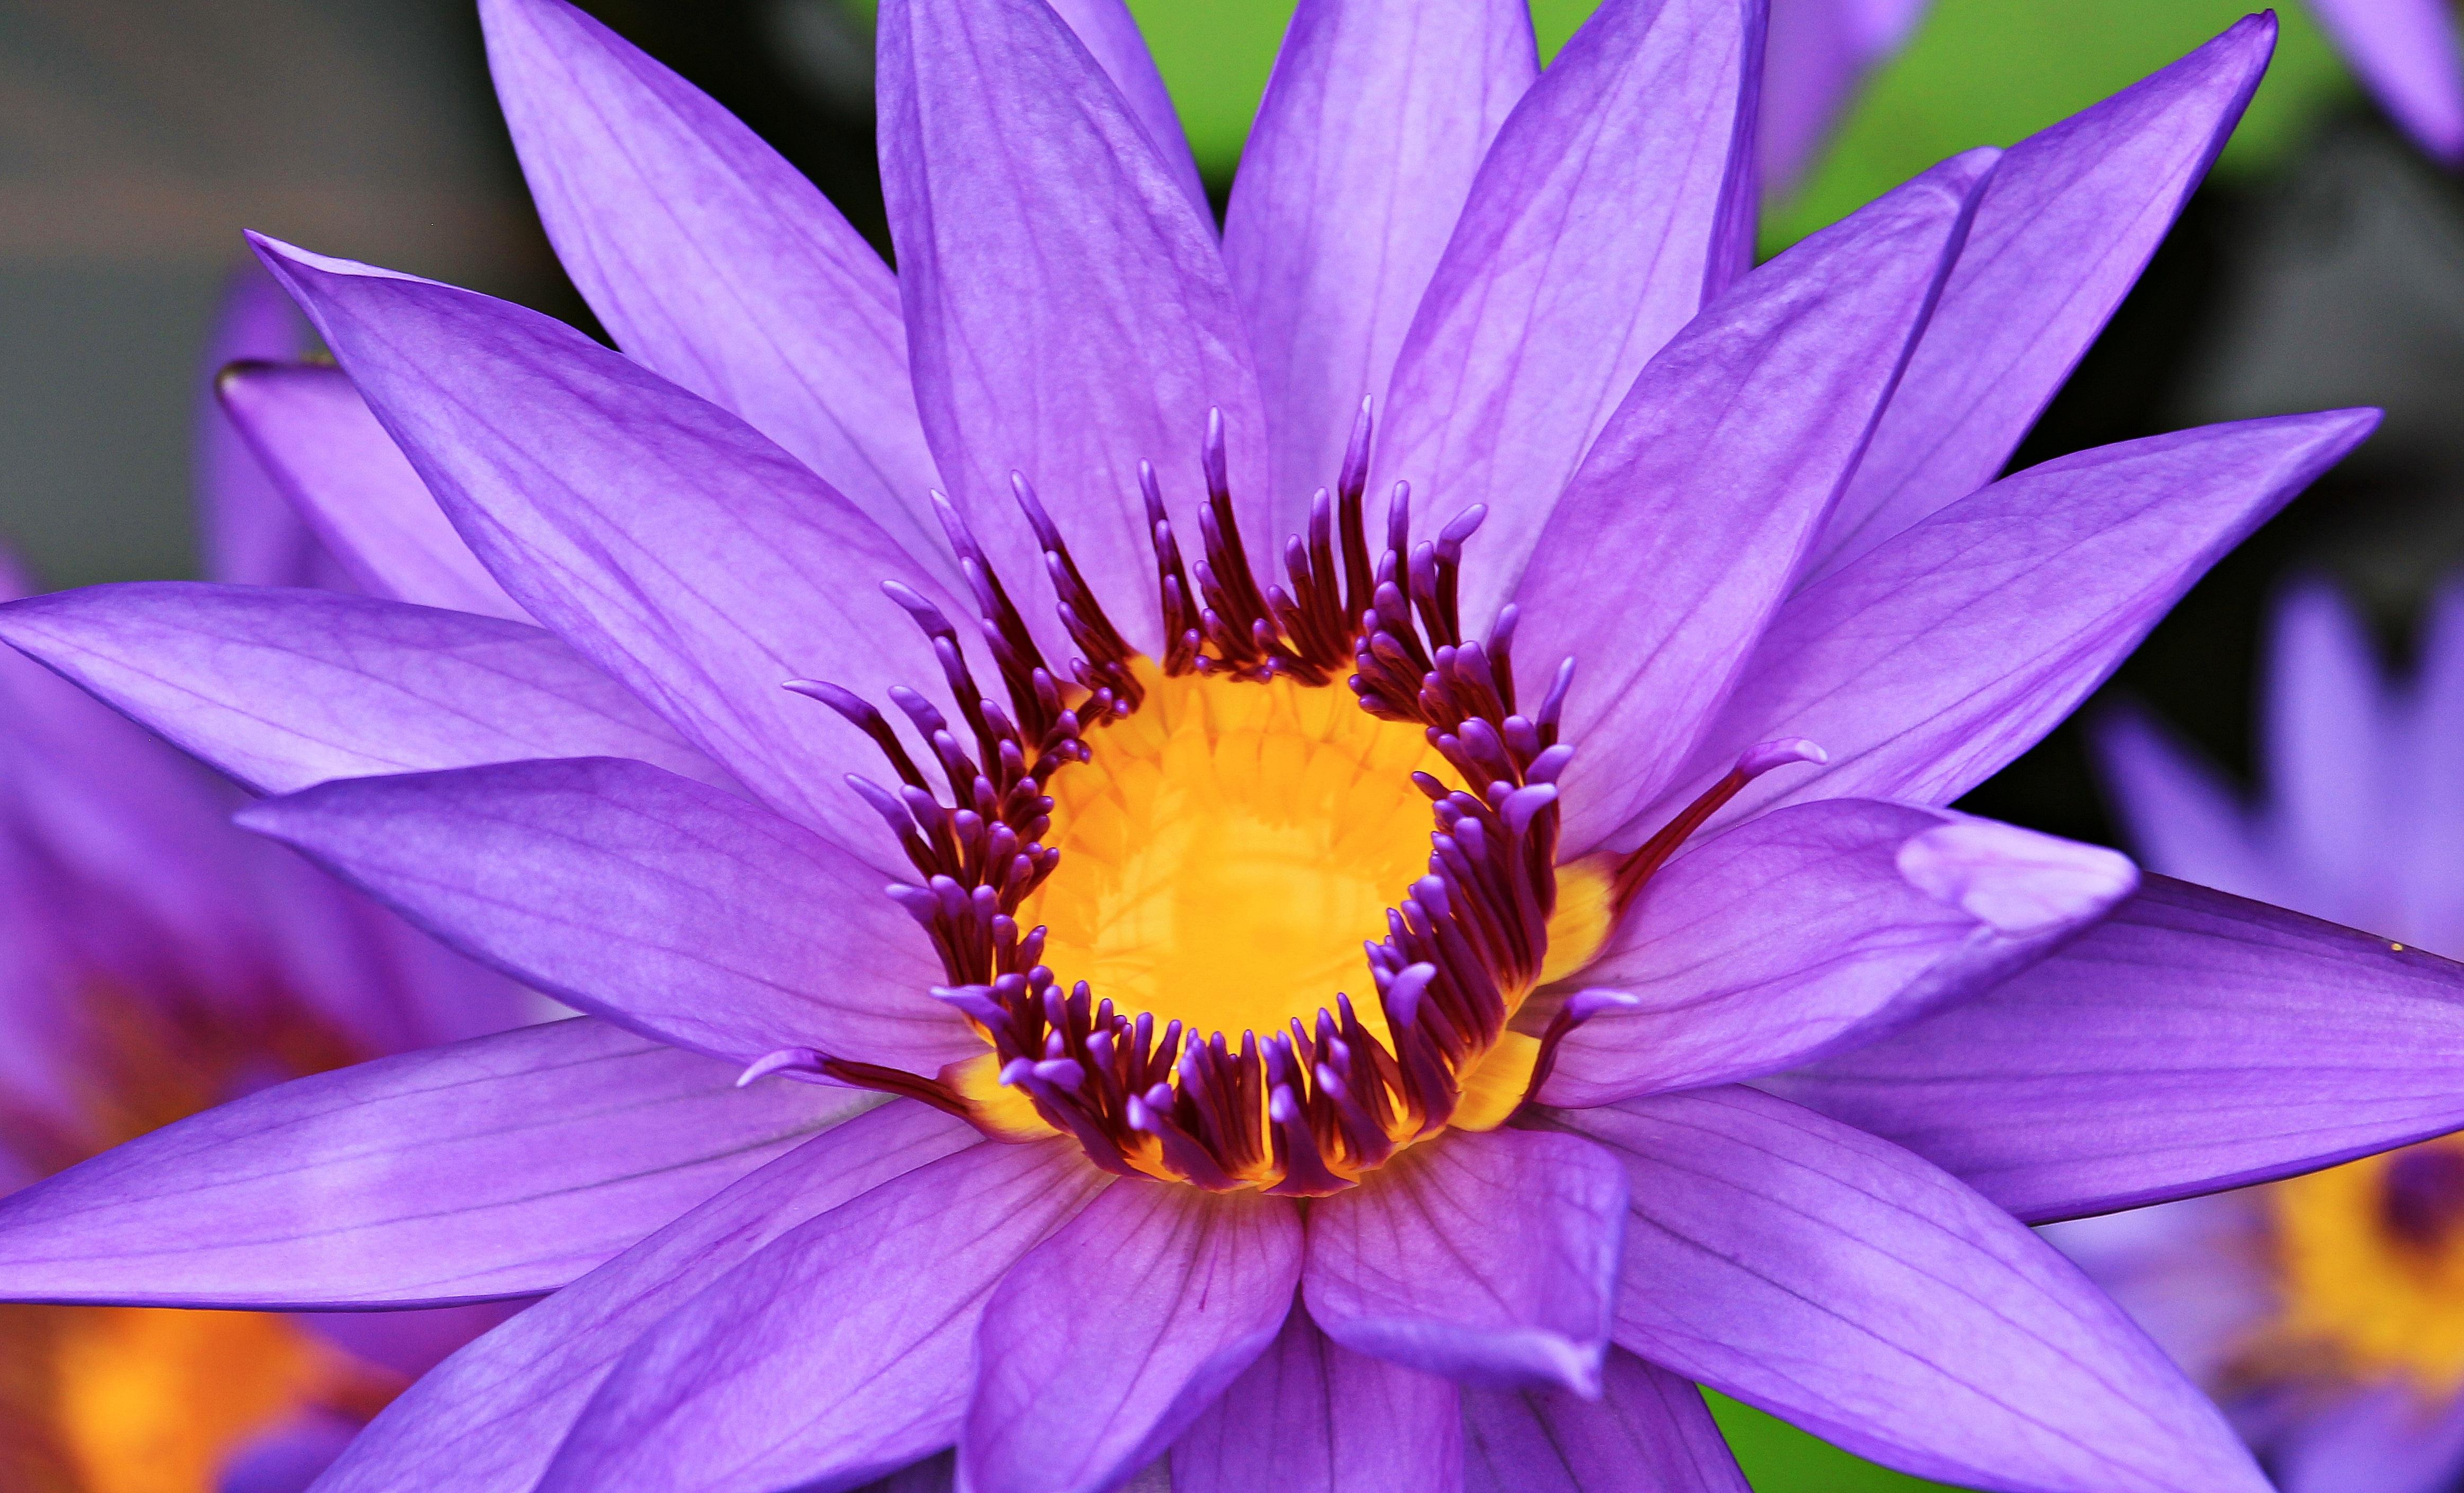 Free Images Nature Petal Bloom Summer Yellow Aquatic Plant